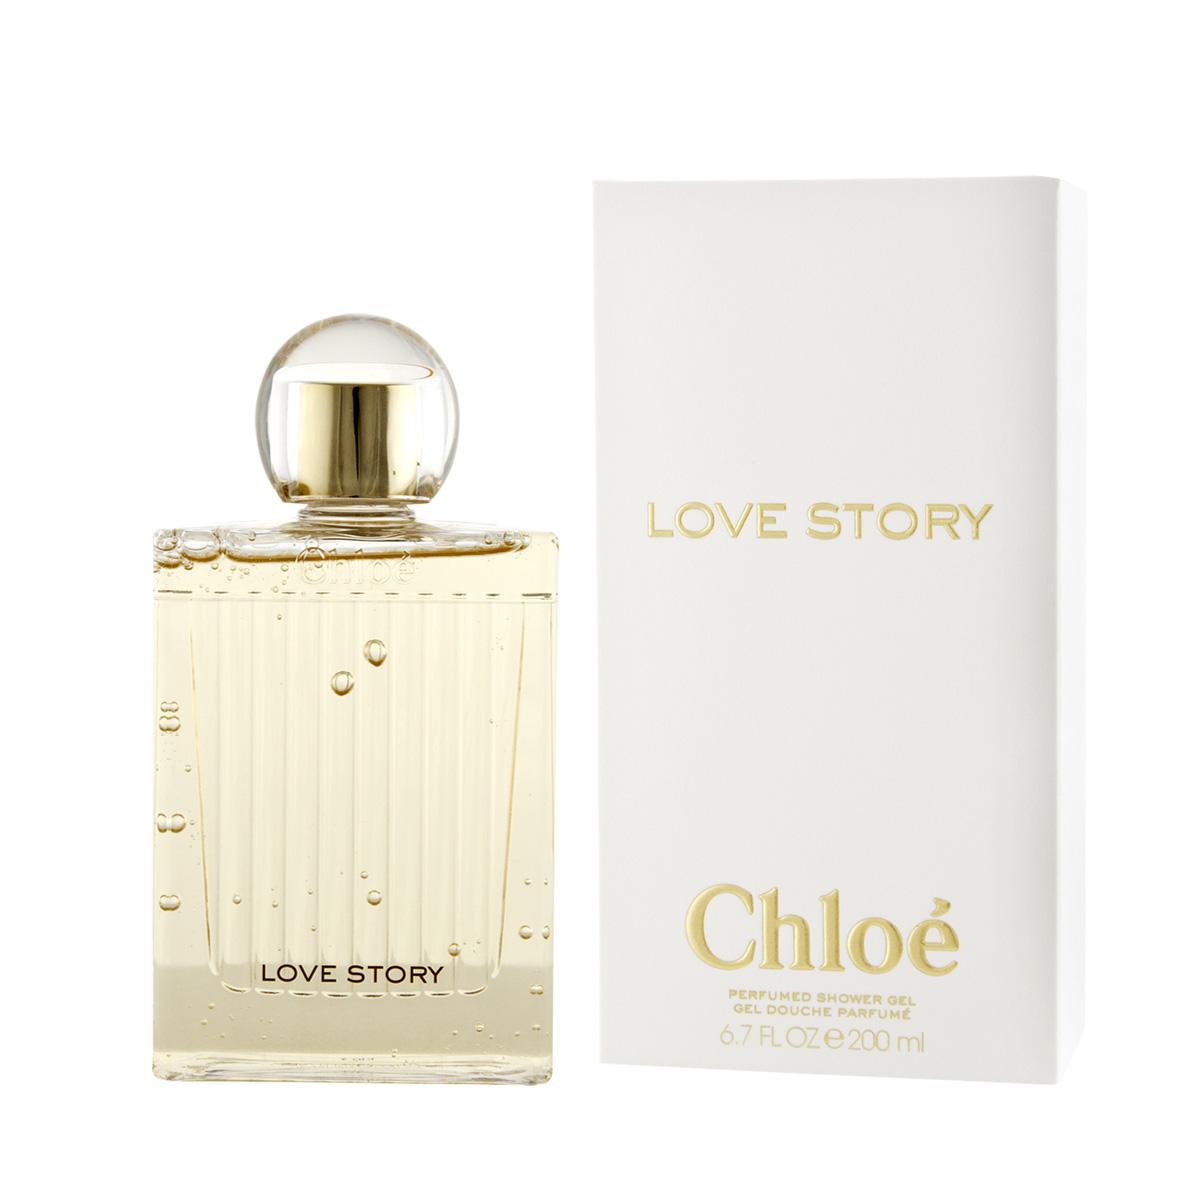 Chloe Love Story SG 200 ml W